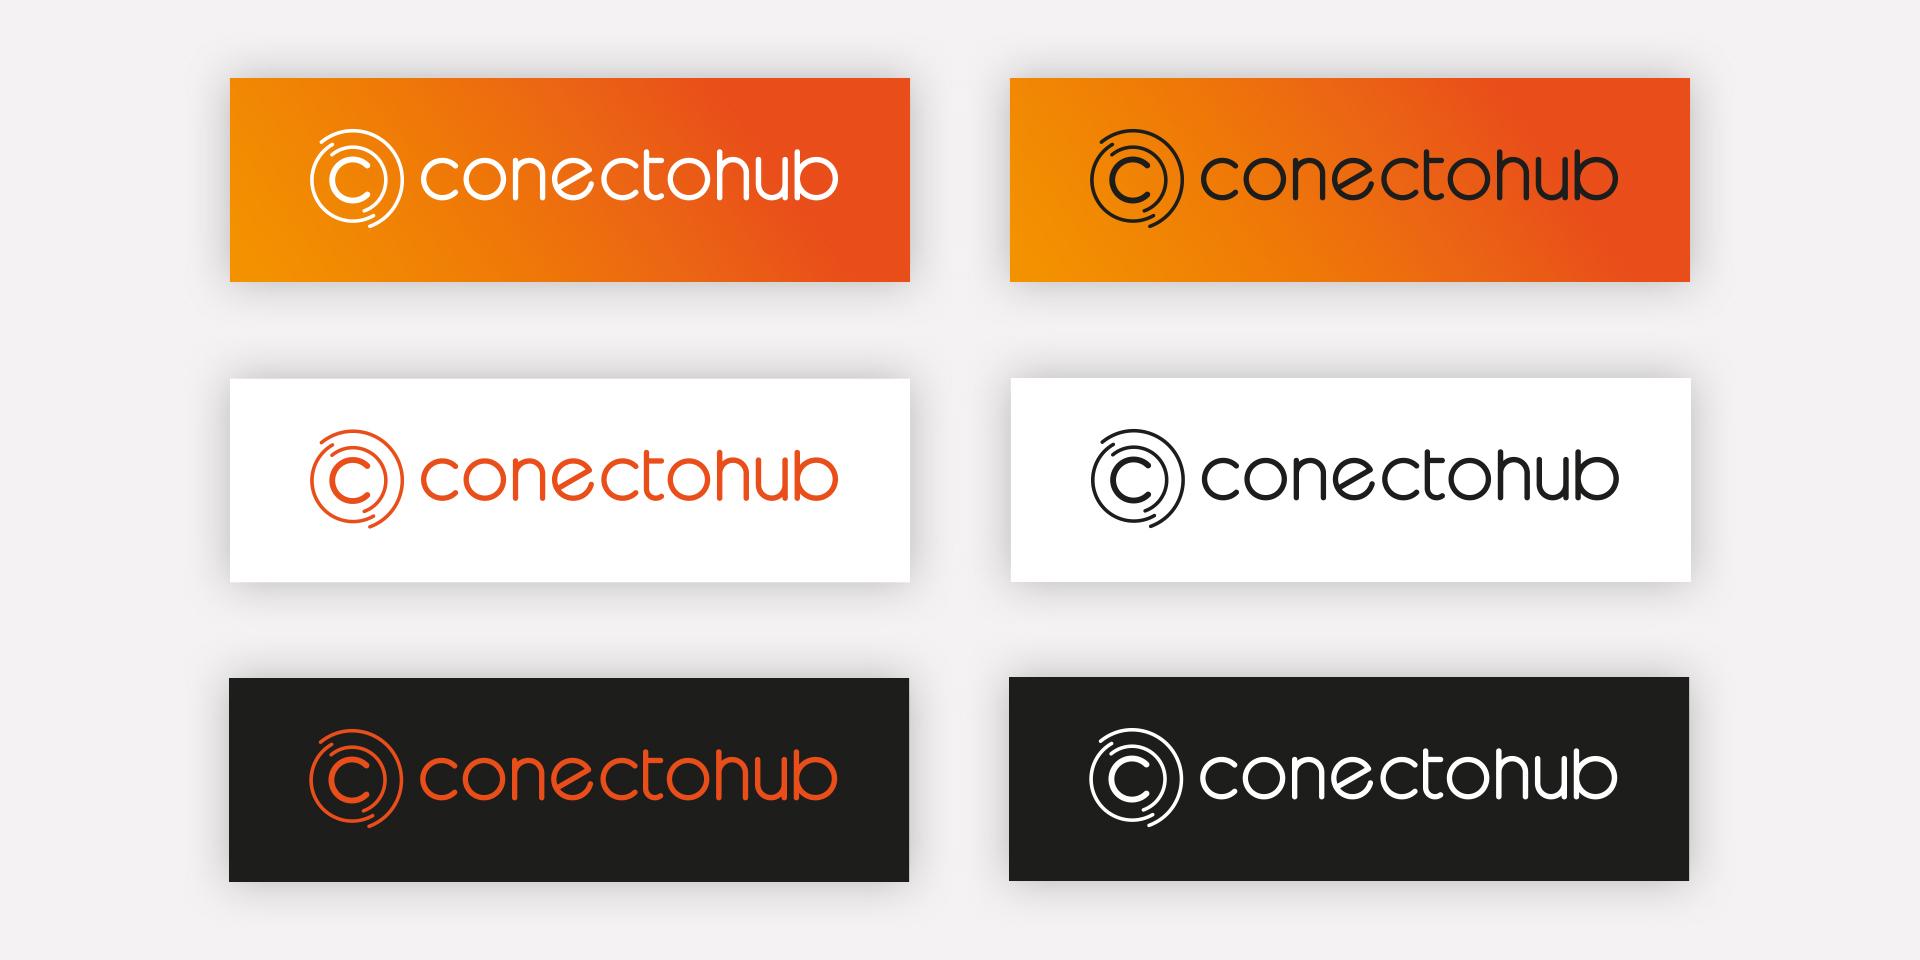 conectohub_logo_horizontal_1920x960